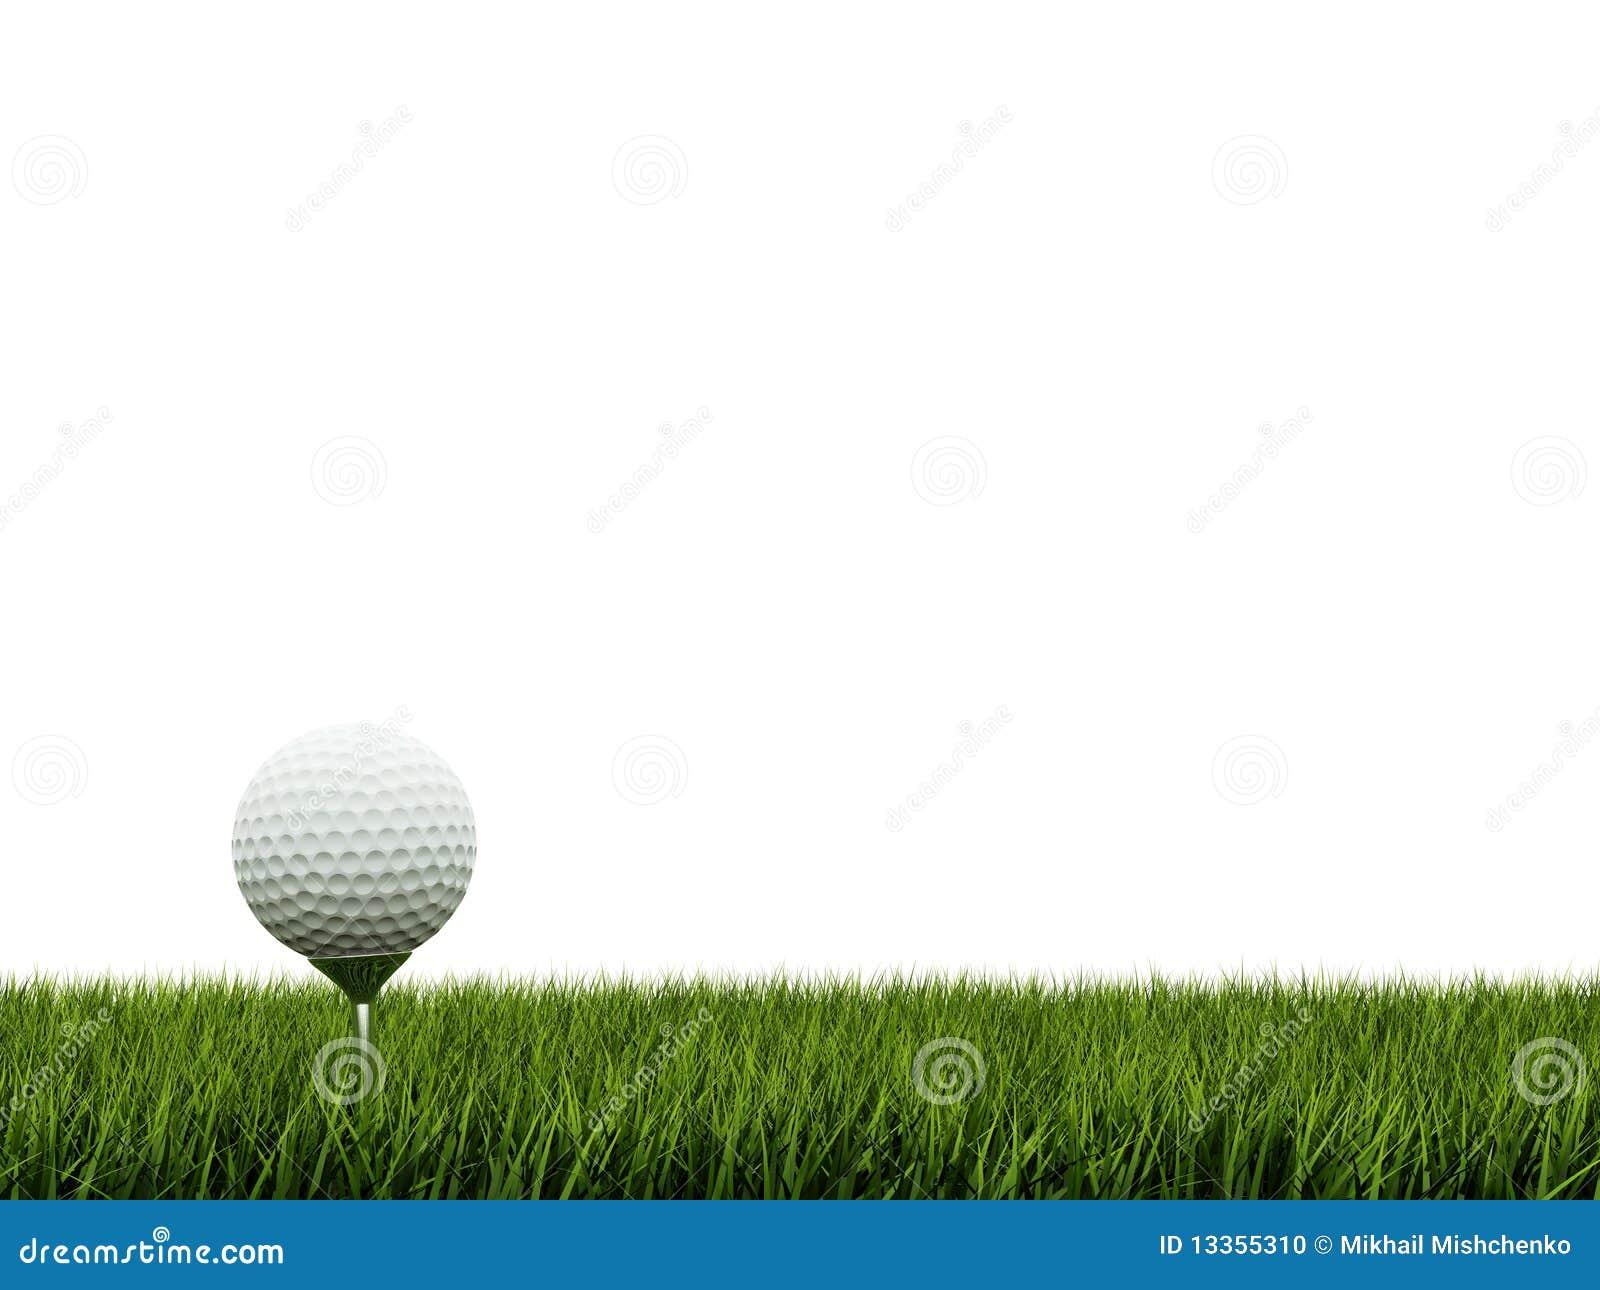 golf ball border clip art - photo #27